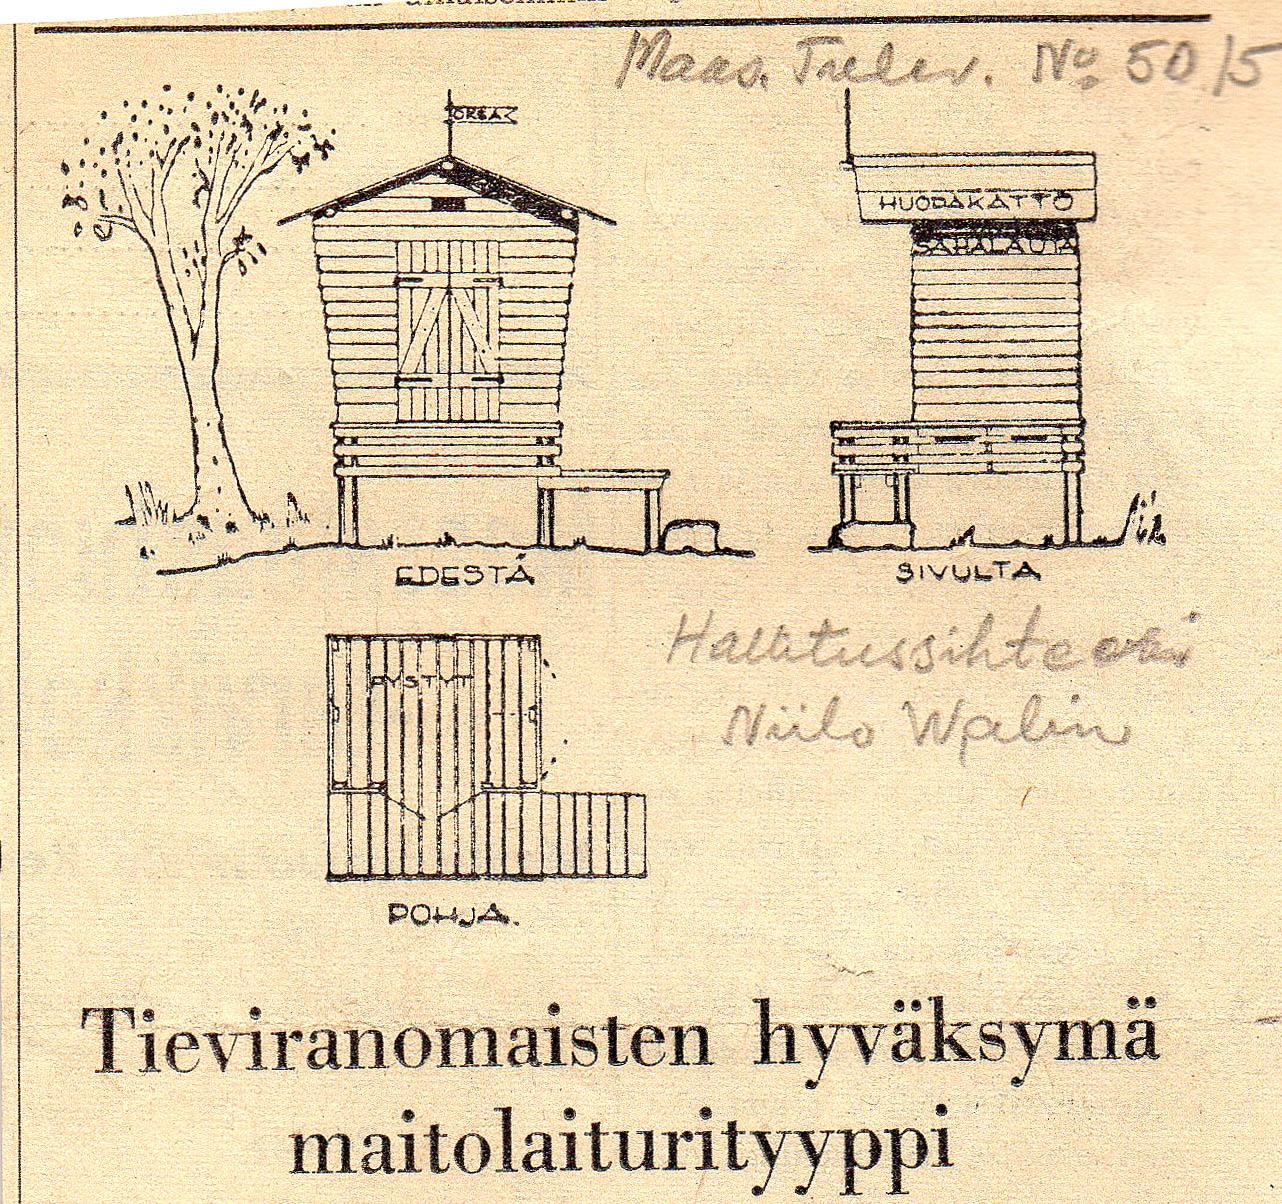 Maitolaiturin uudet tuulet 1951